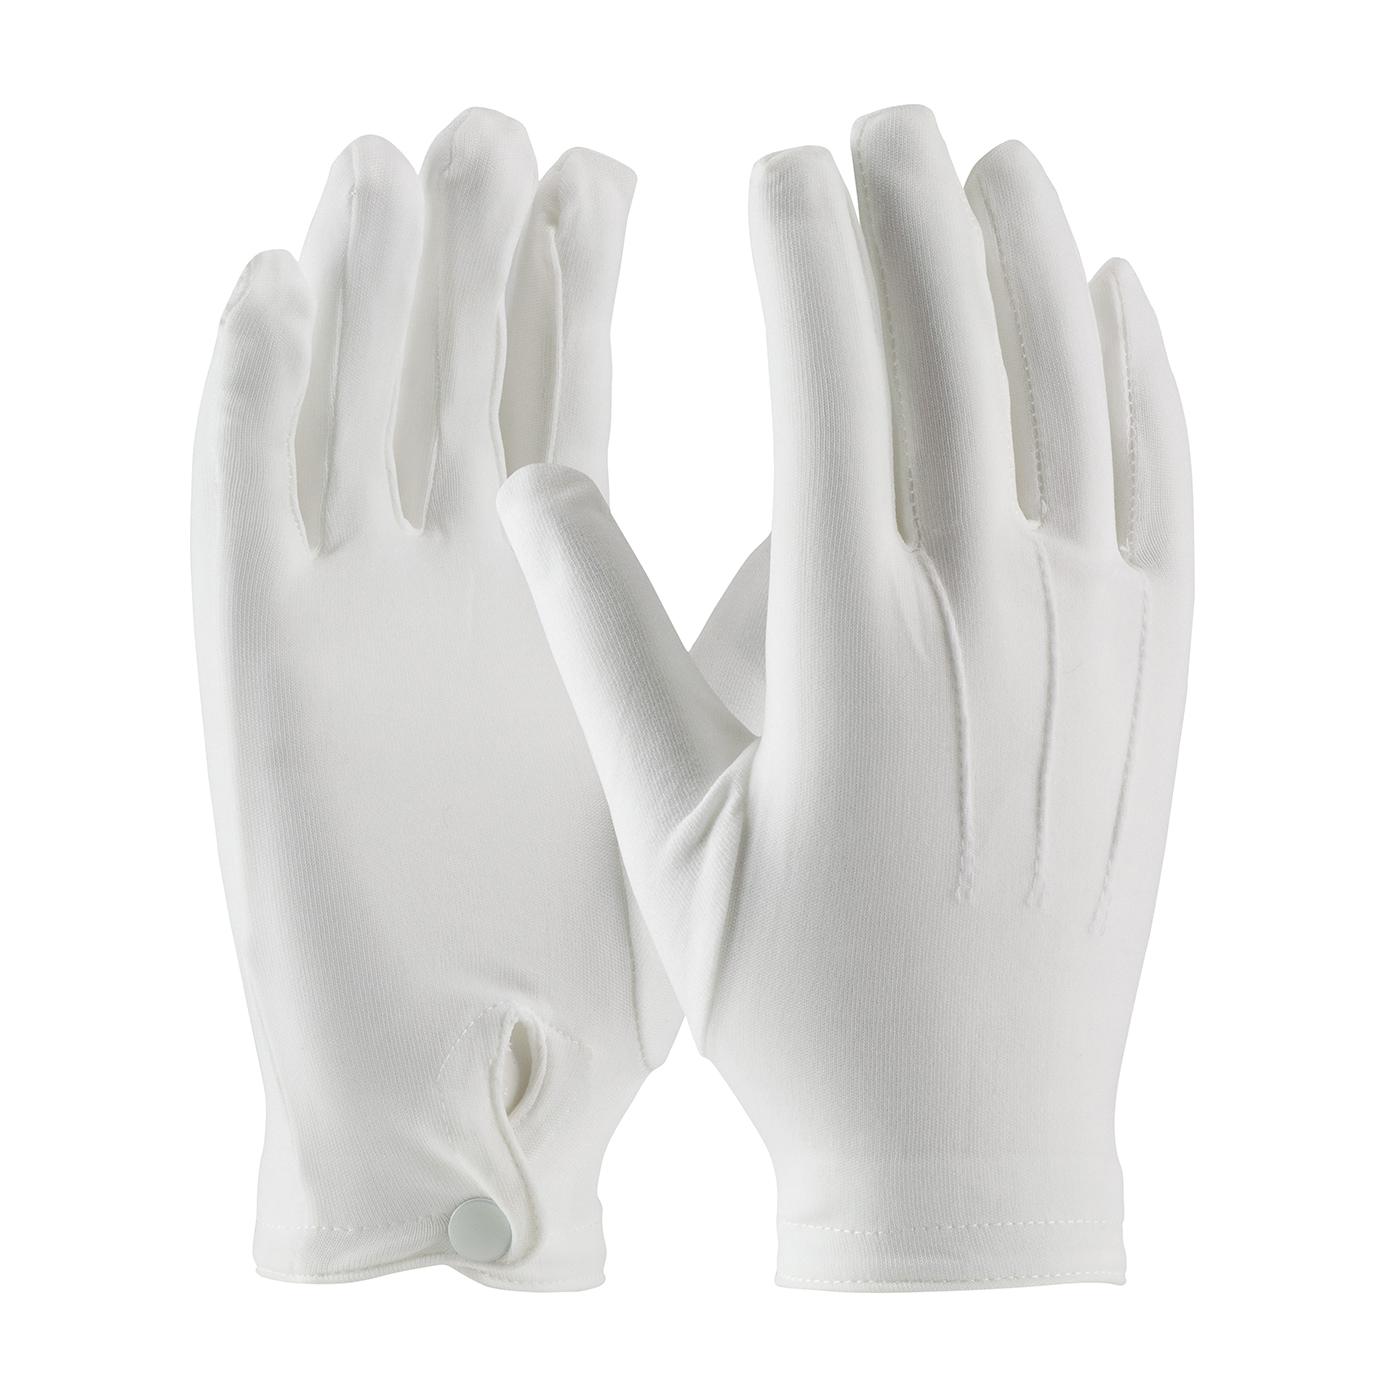 PIP® Cabaret™ 130-650WL Cabaret™ Ladies Dress Gloves With Raised Stitching on Back, Nylon, White, Unlined Lining, Resists: Abrasion and Cut